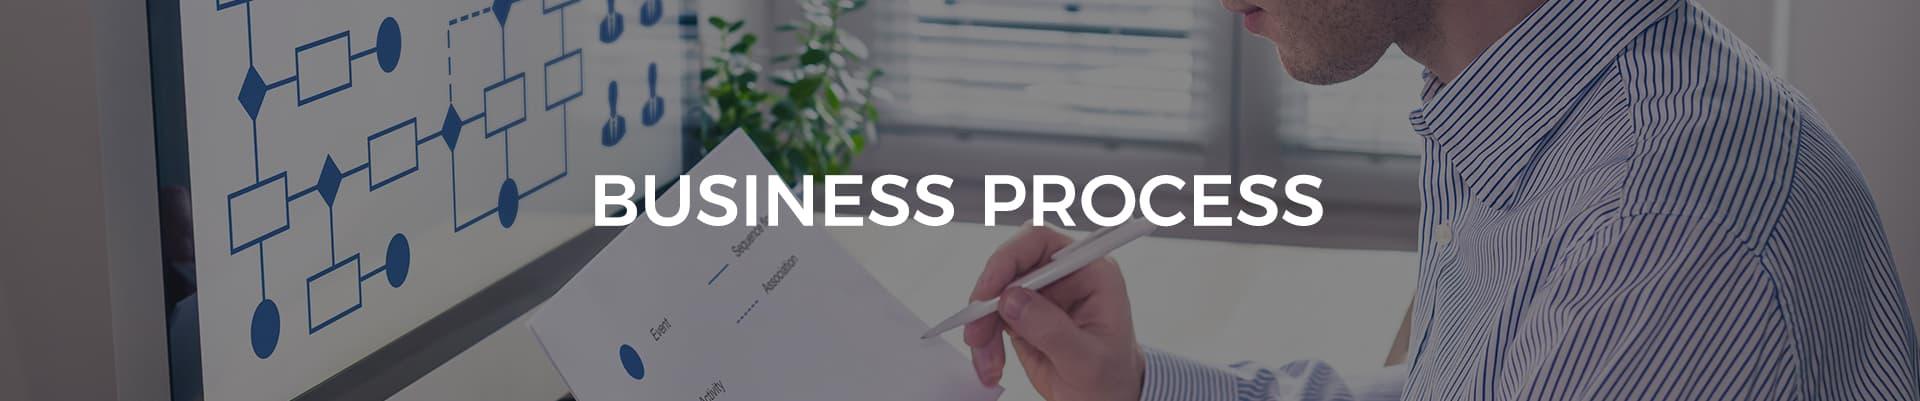 6-business-process_02